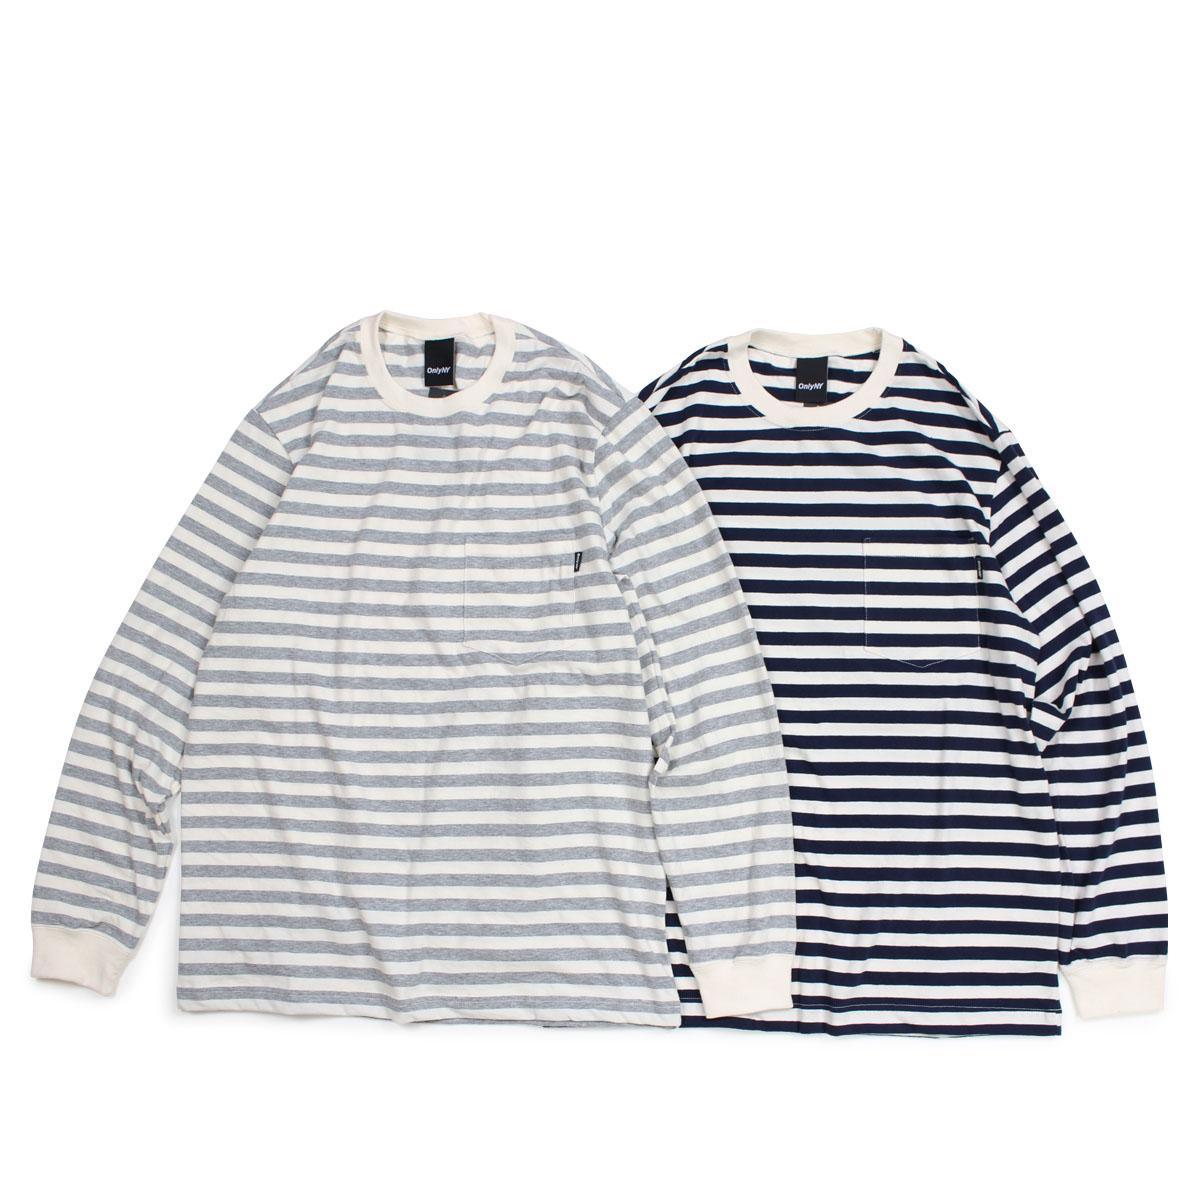 e72d5fe2cf ONLY NY NAUTICAL STRIPE LS POCKET T-SHIRTS only New York T-shirt men ...